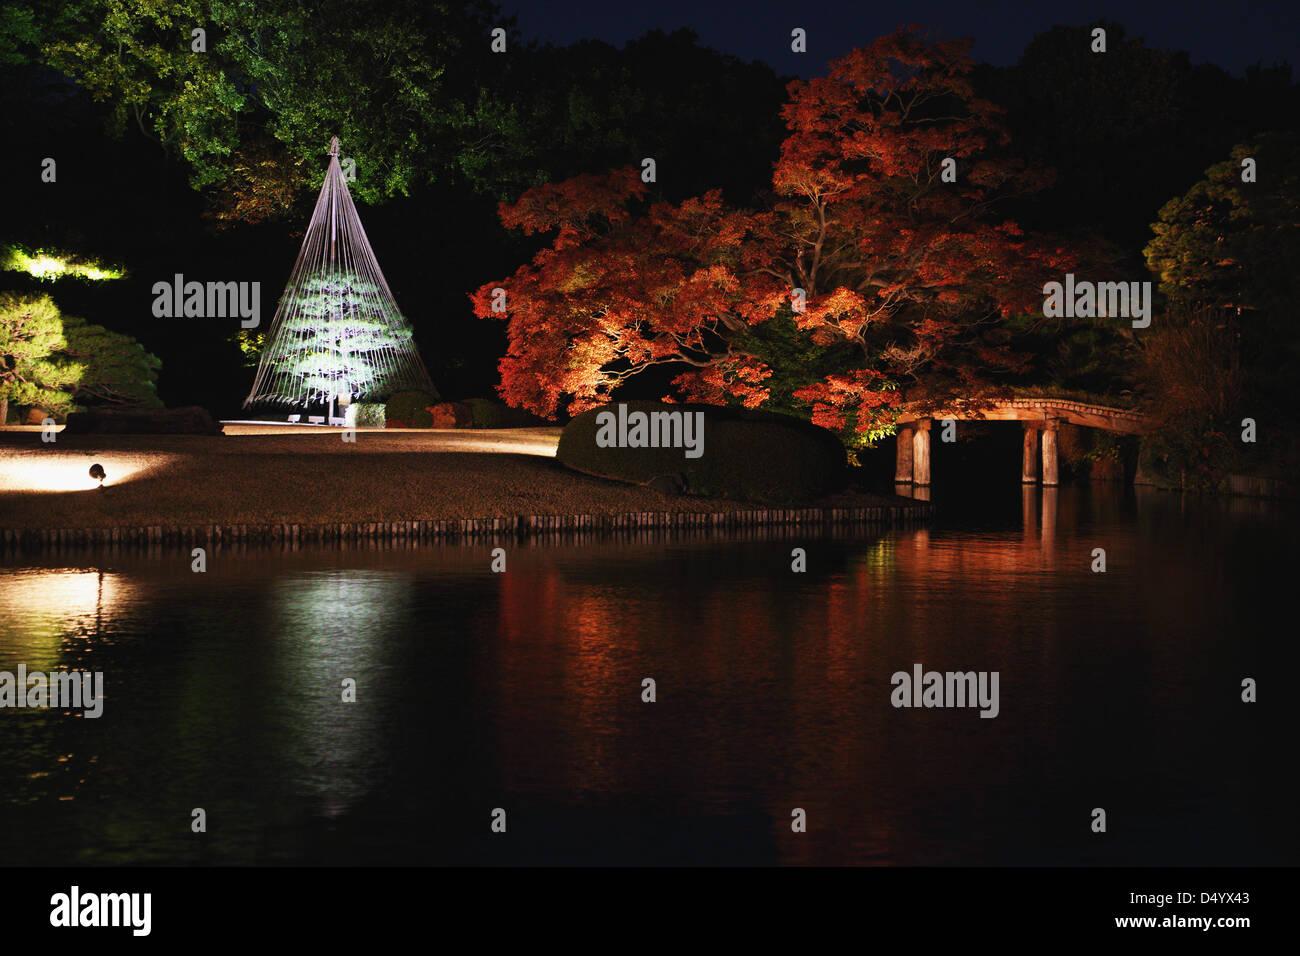 Illuminazione notturna al giardino rikugien tokyo foto immagine